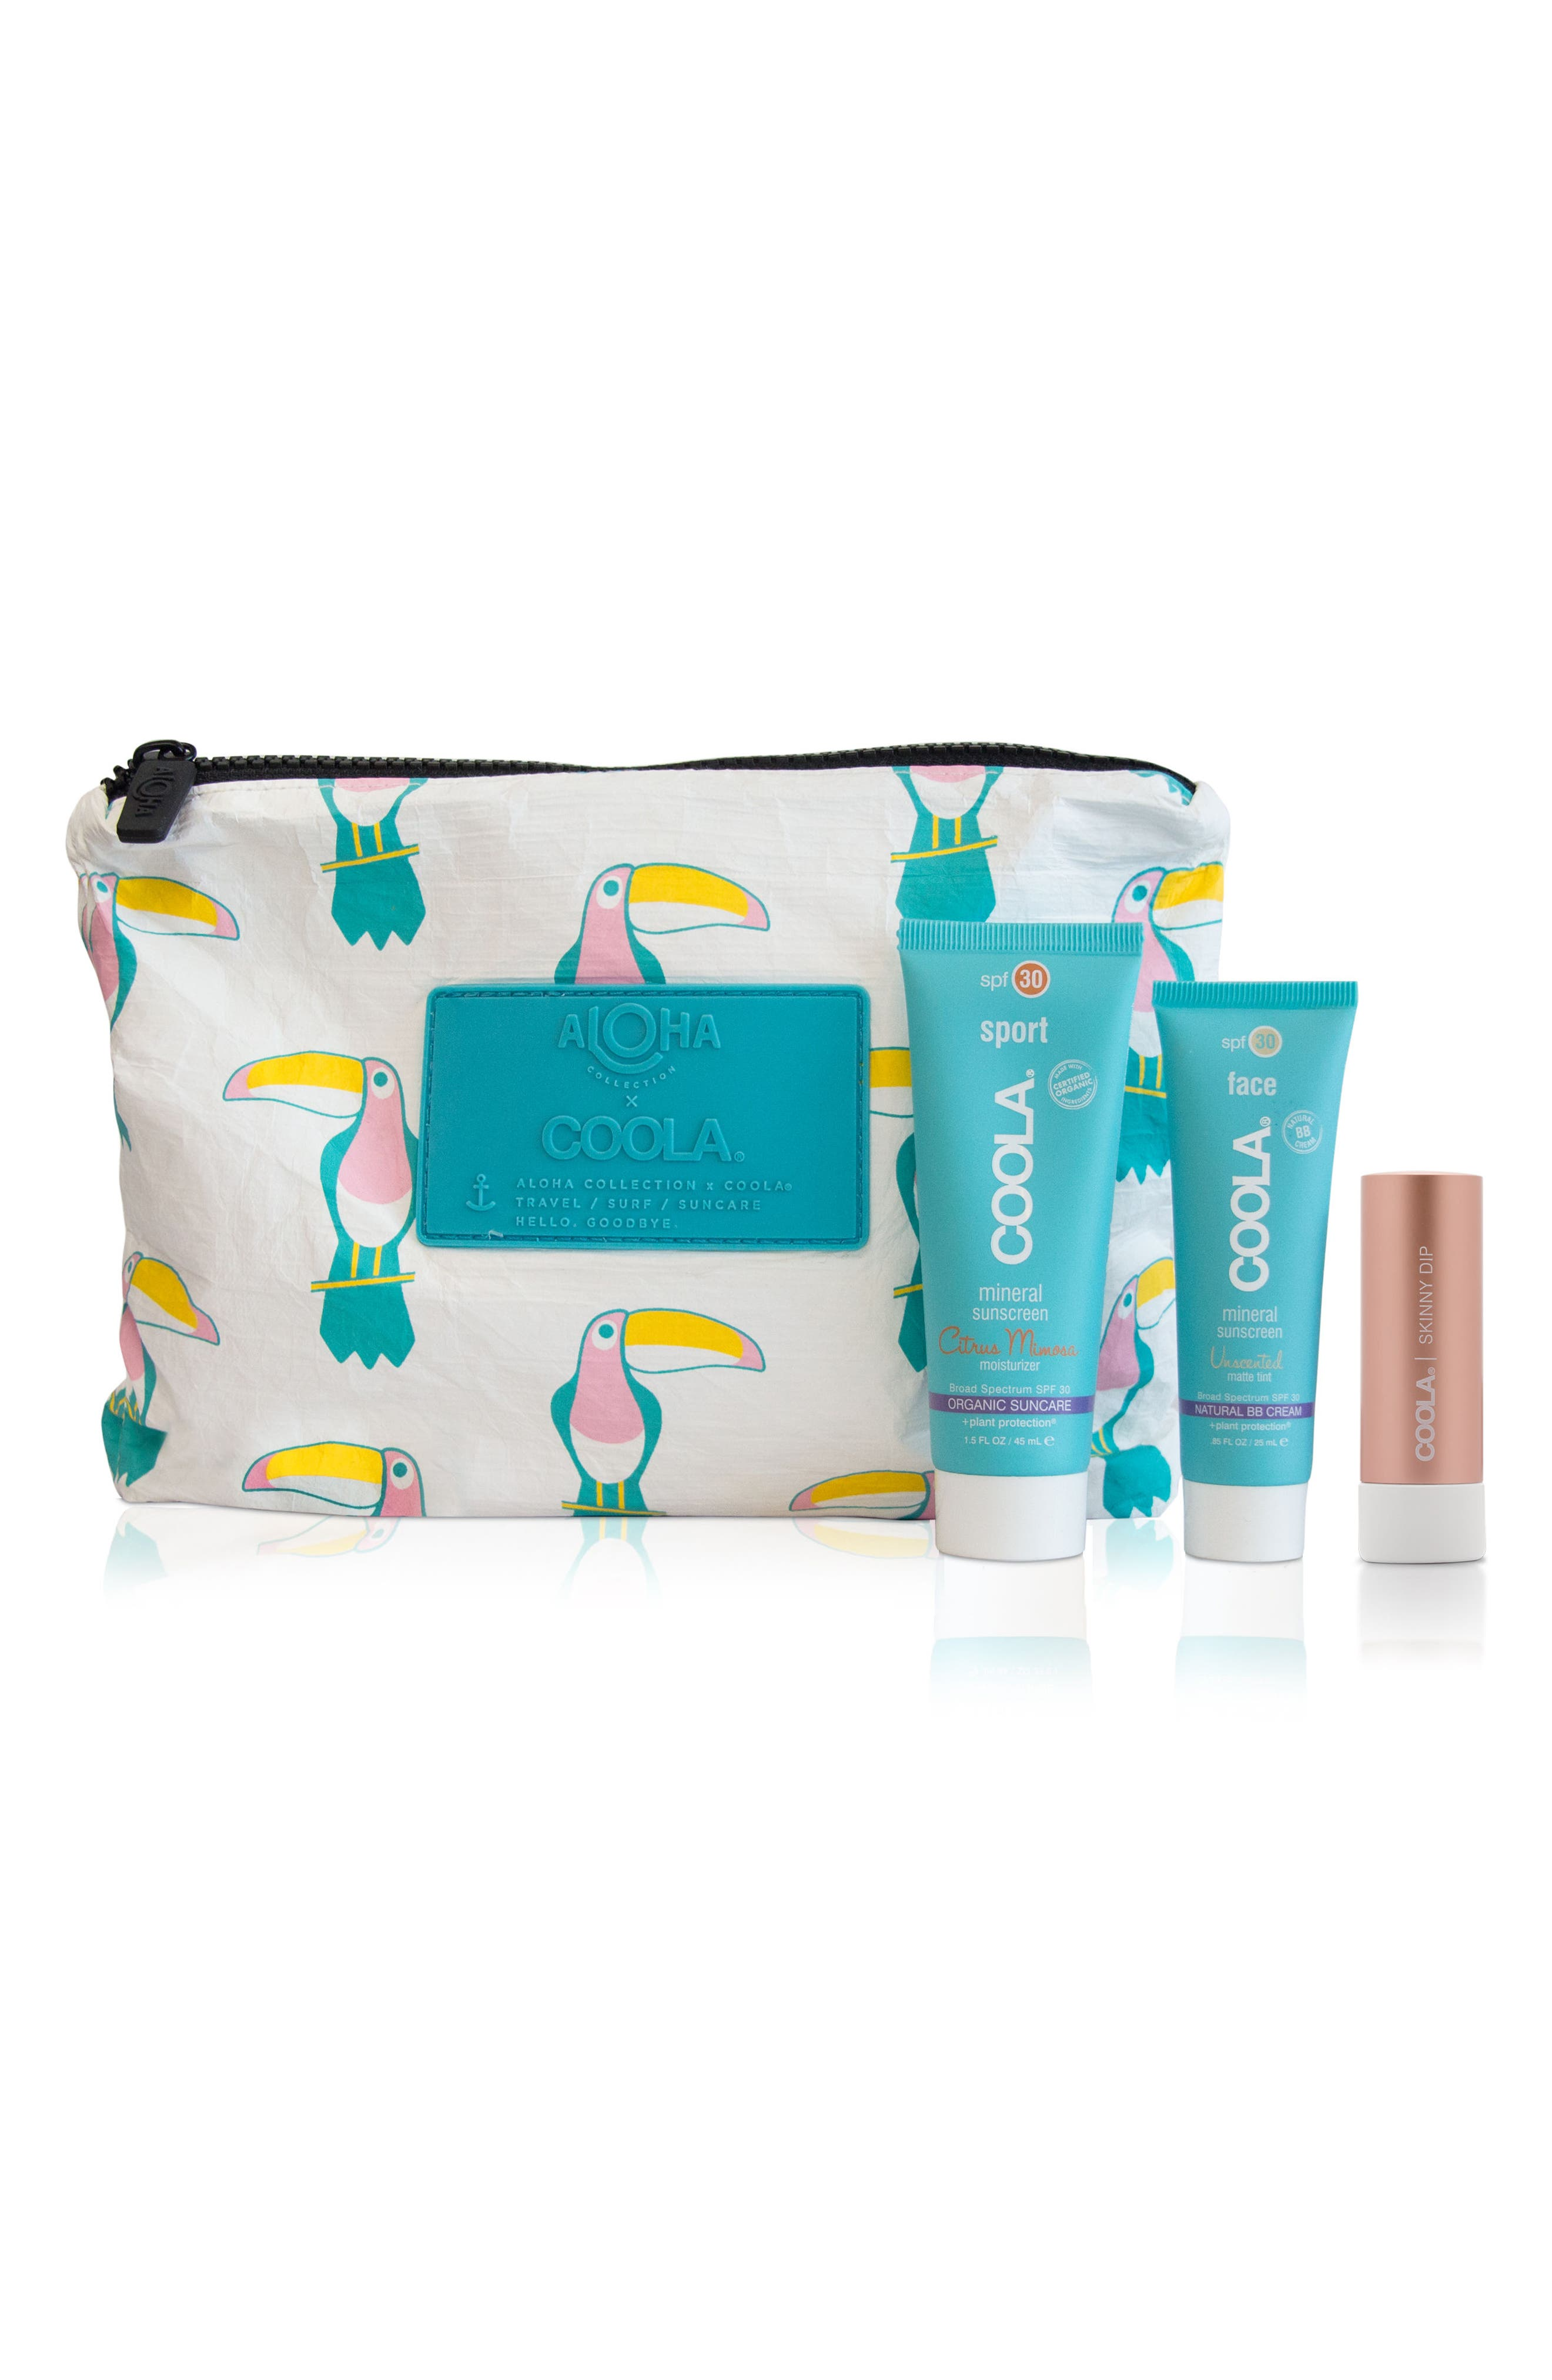 COOLA<sup>®</sup> Suncare x ALOHA Travel Set,                         Main,                         color, No Color